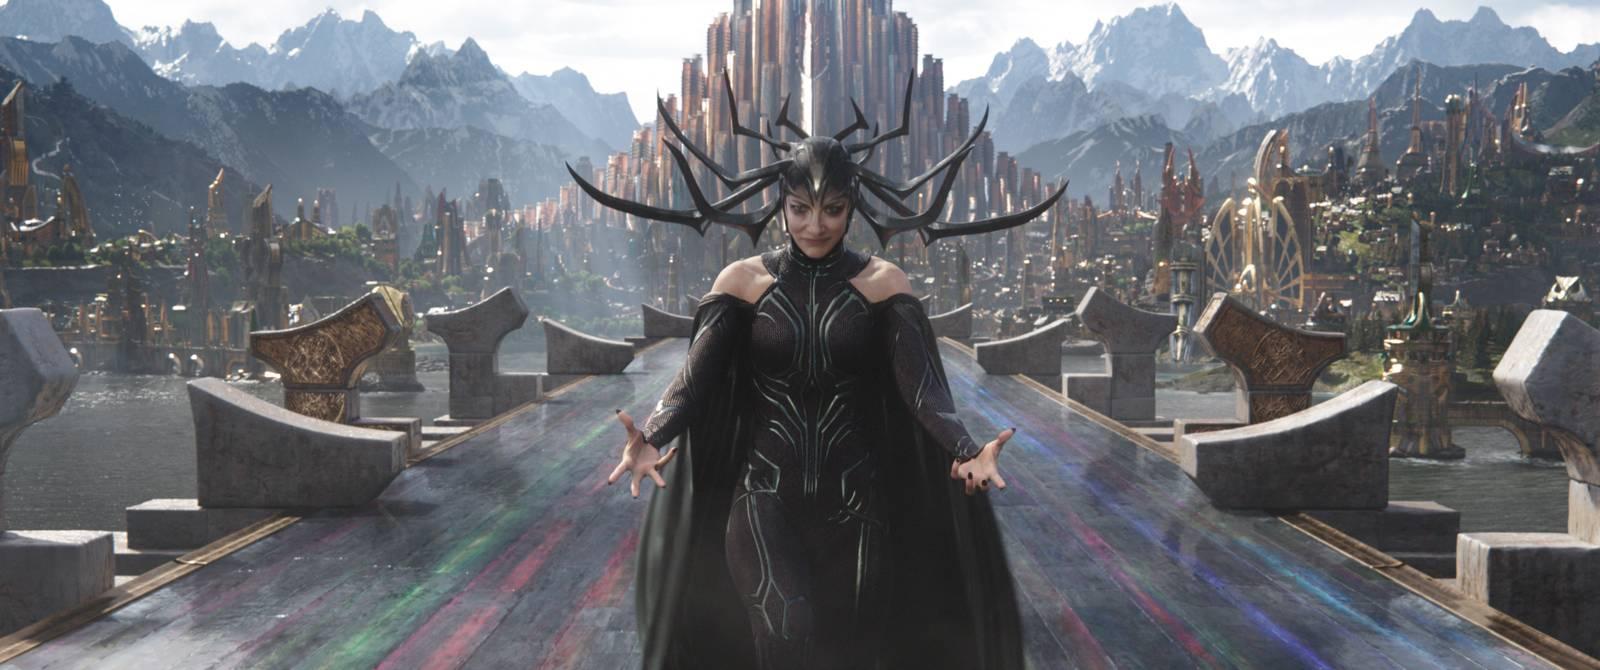 Film Thor: Ragnarok (2017)